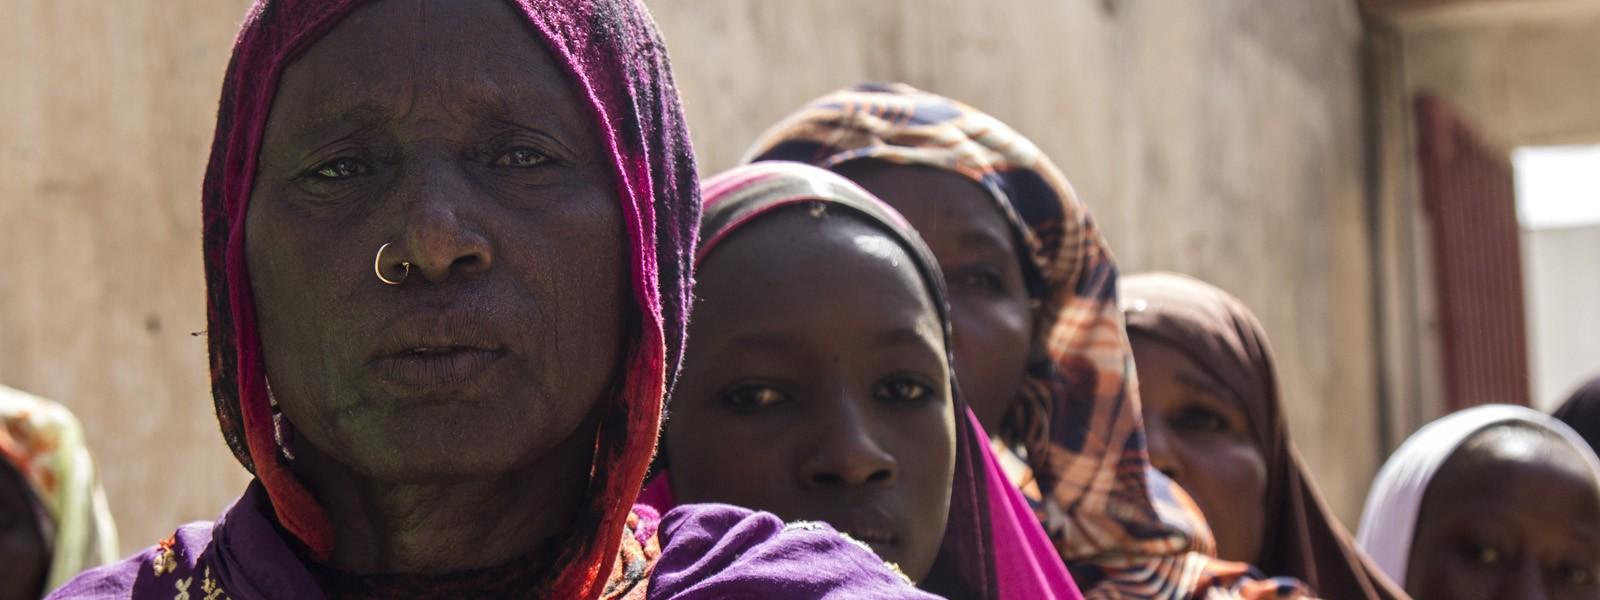 Nigeria and Lake Chad Crisis